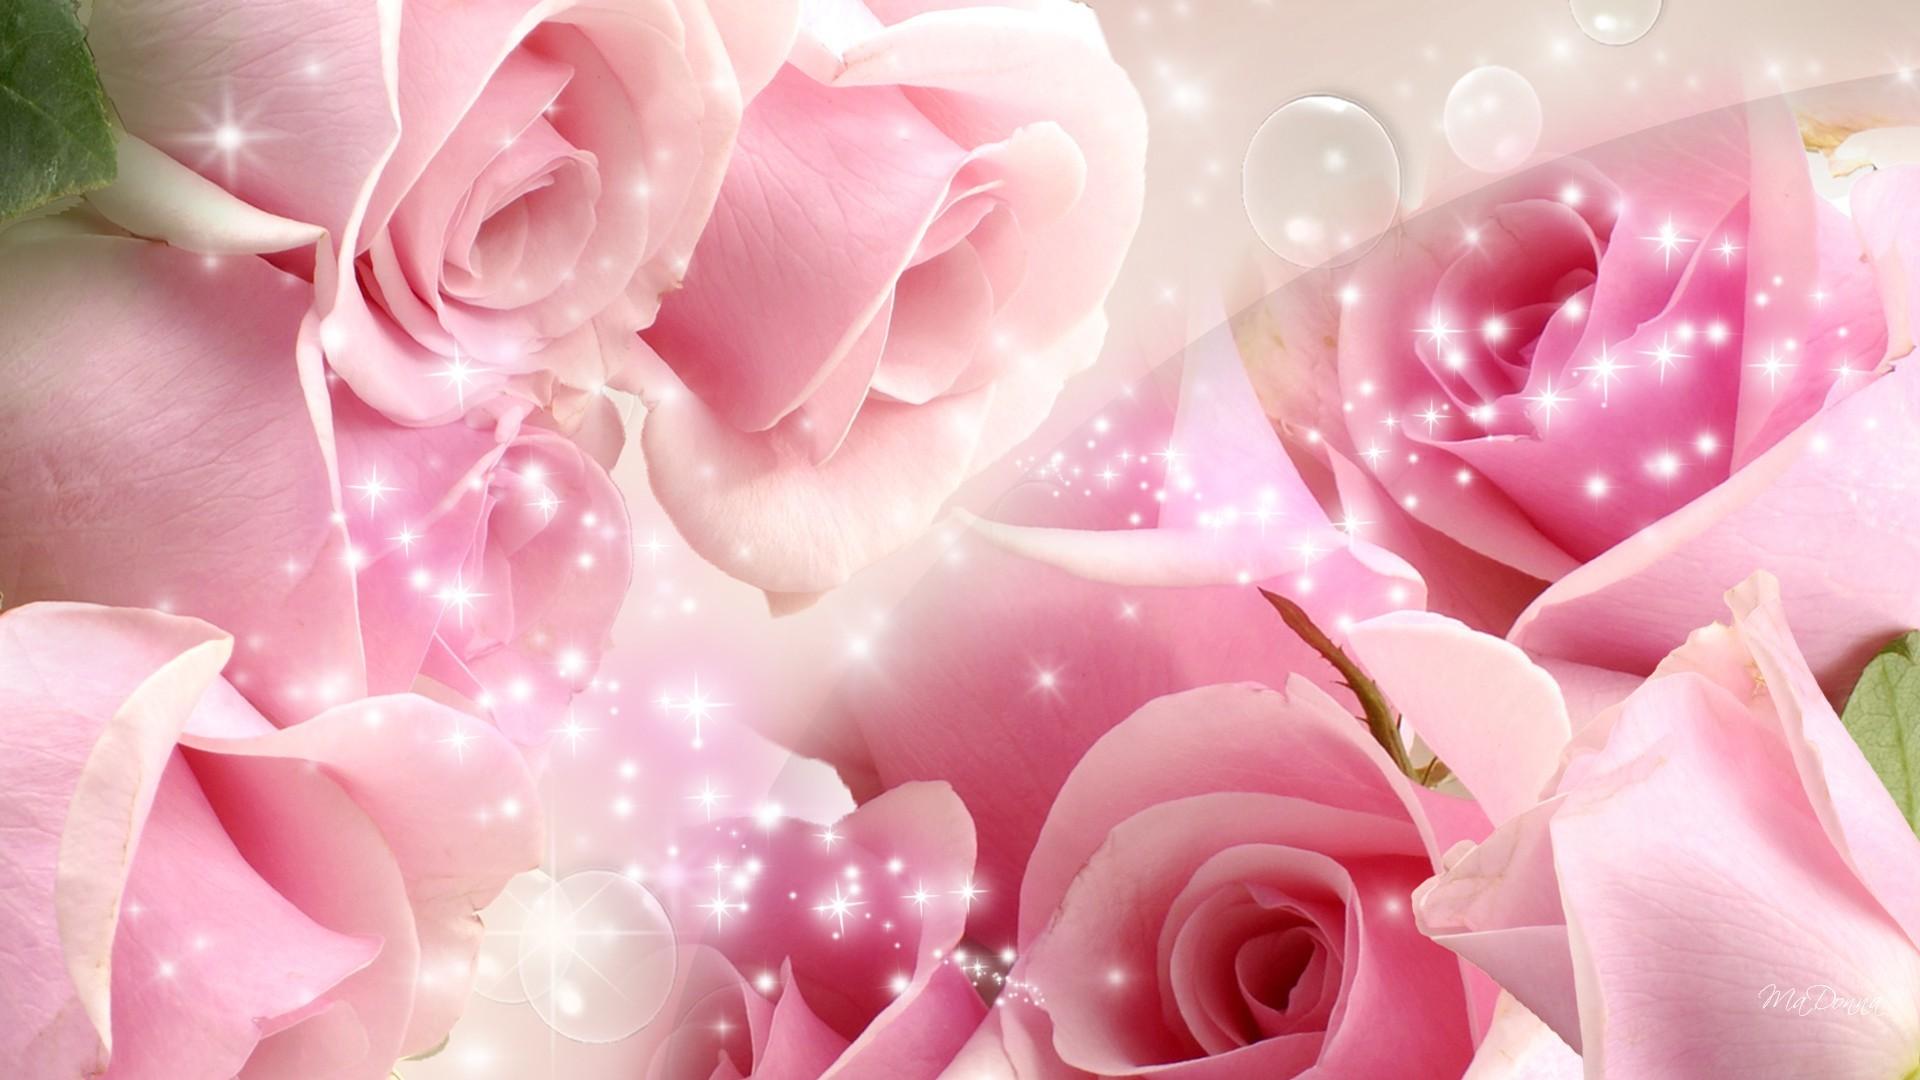 Res: 1920x1080, Cool Pink Rose